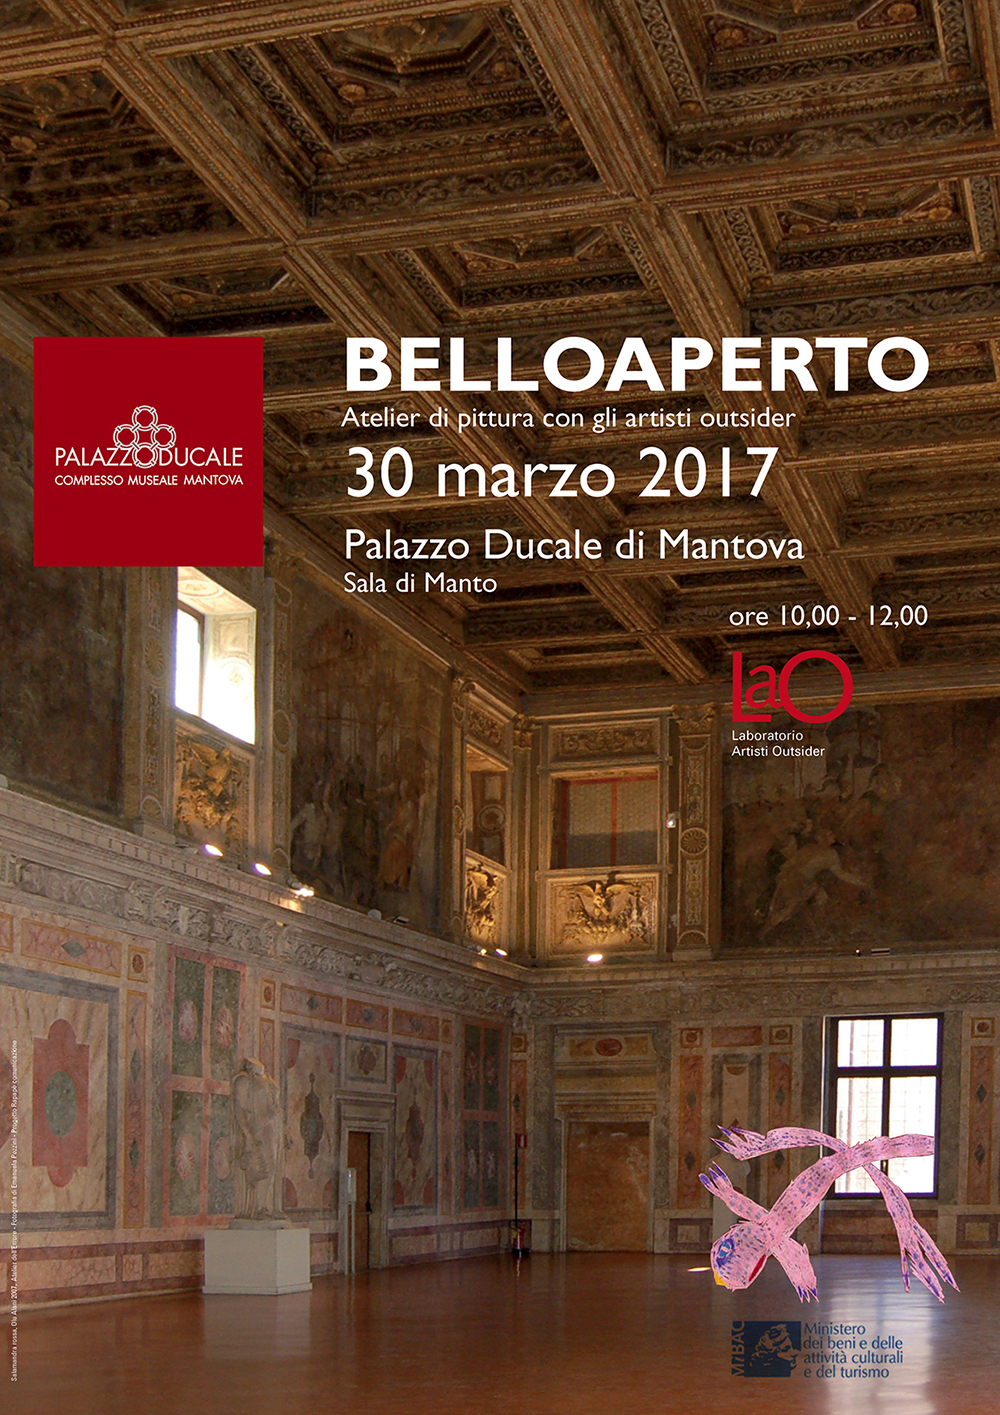 Lao_Palazzo Ducale_Mantova marzo_2017